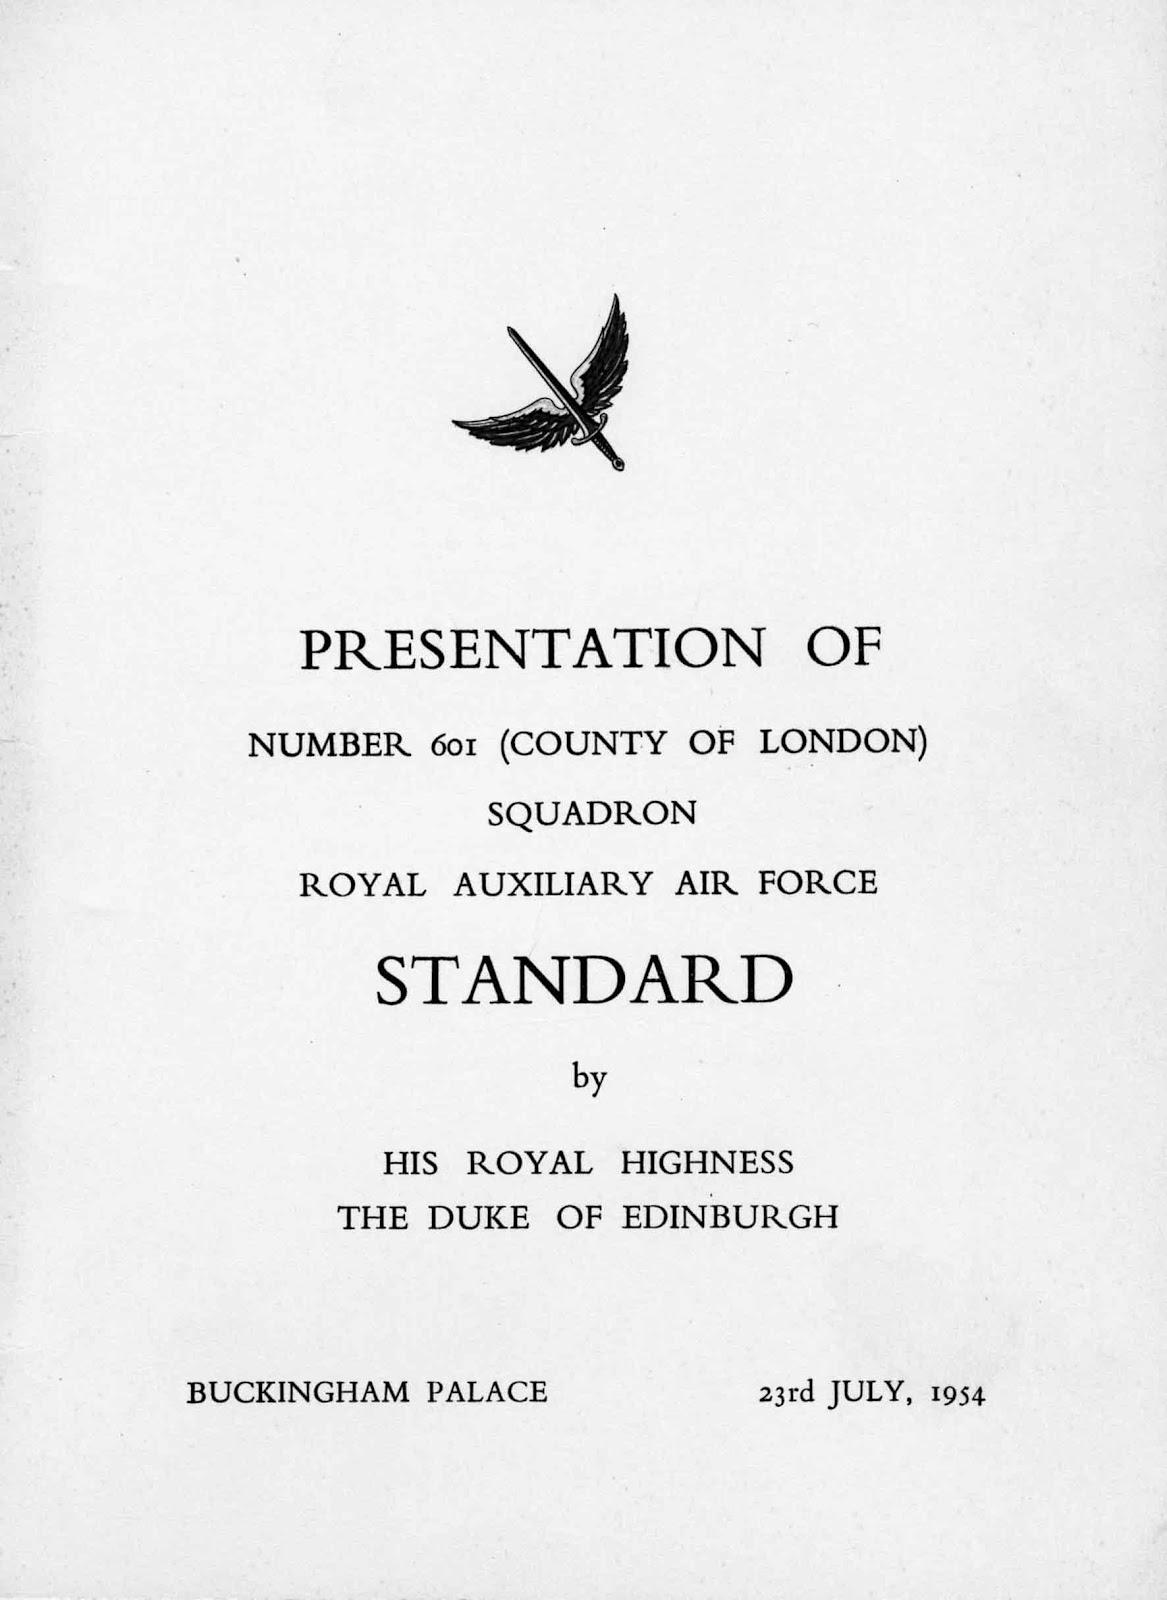 601 Squadron Standard programme 1